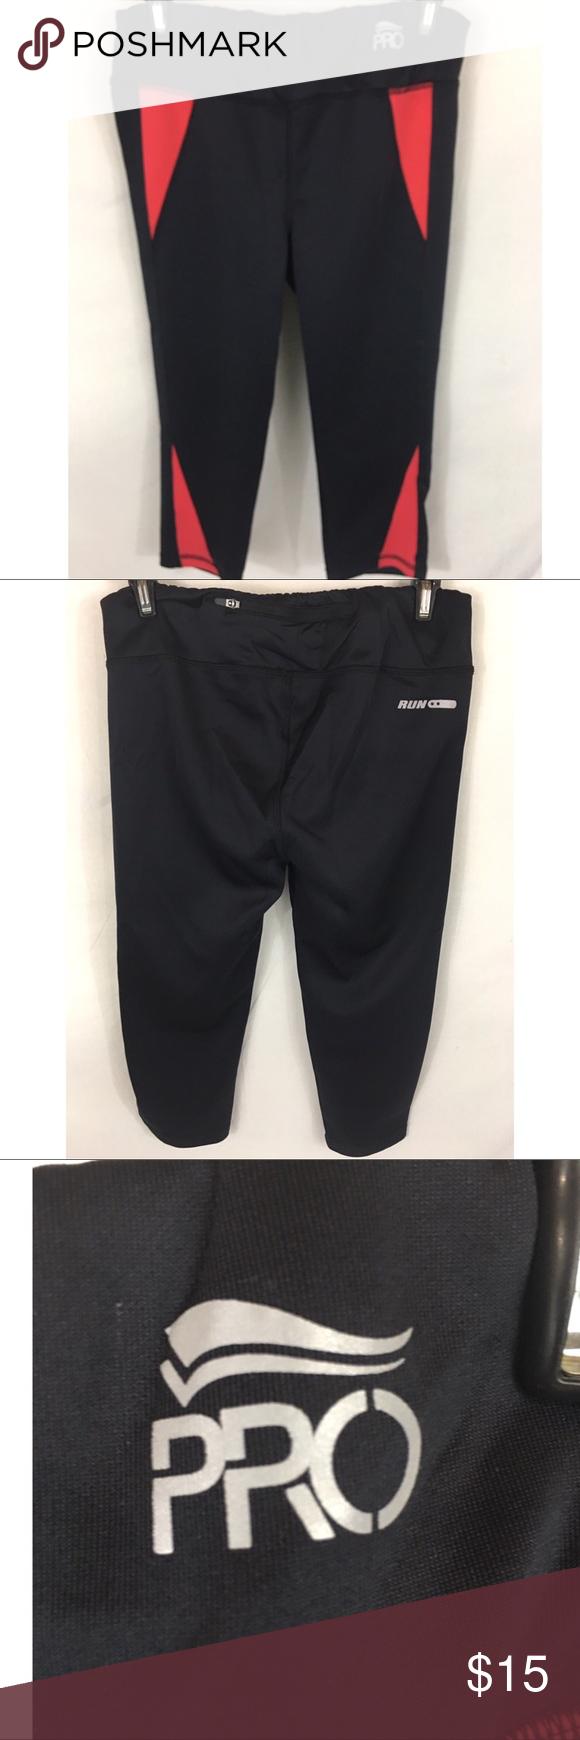 Crivit Pro Athletic Pants Women s Small Capri crivit pro athletic leggings  womens small black red 8b95a4ee210